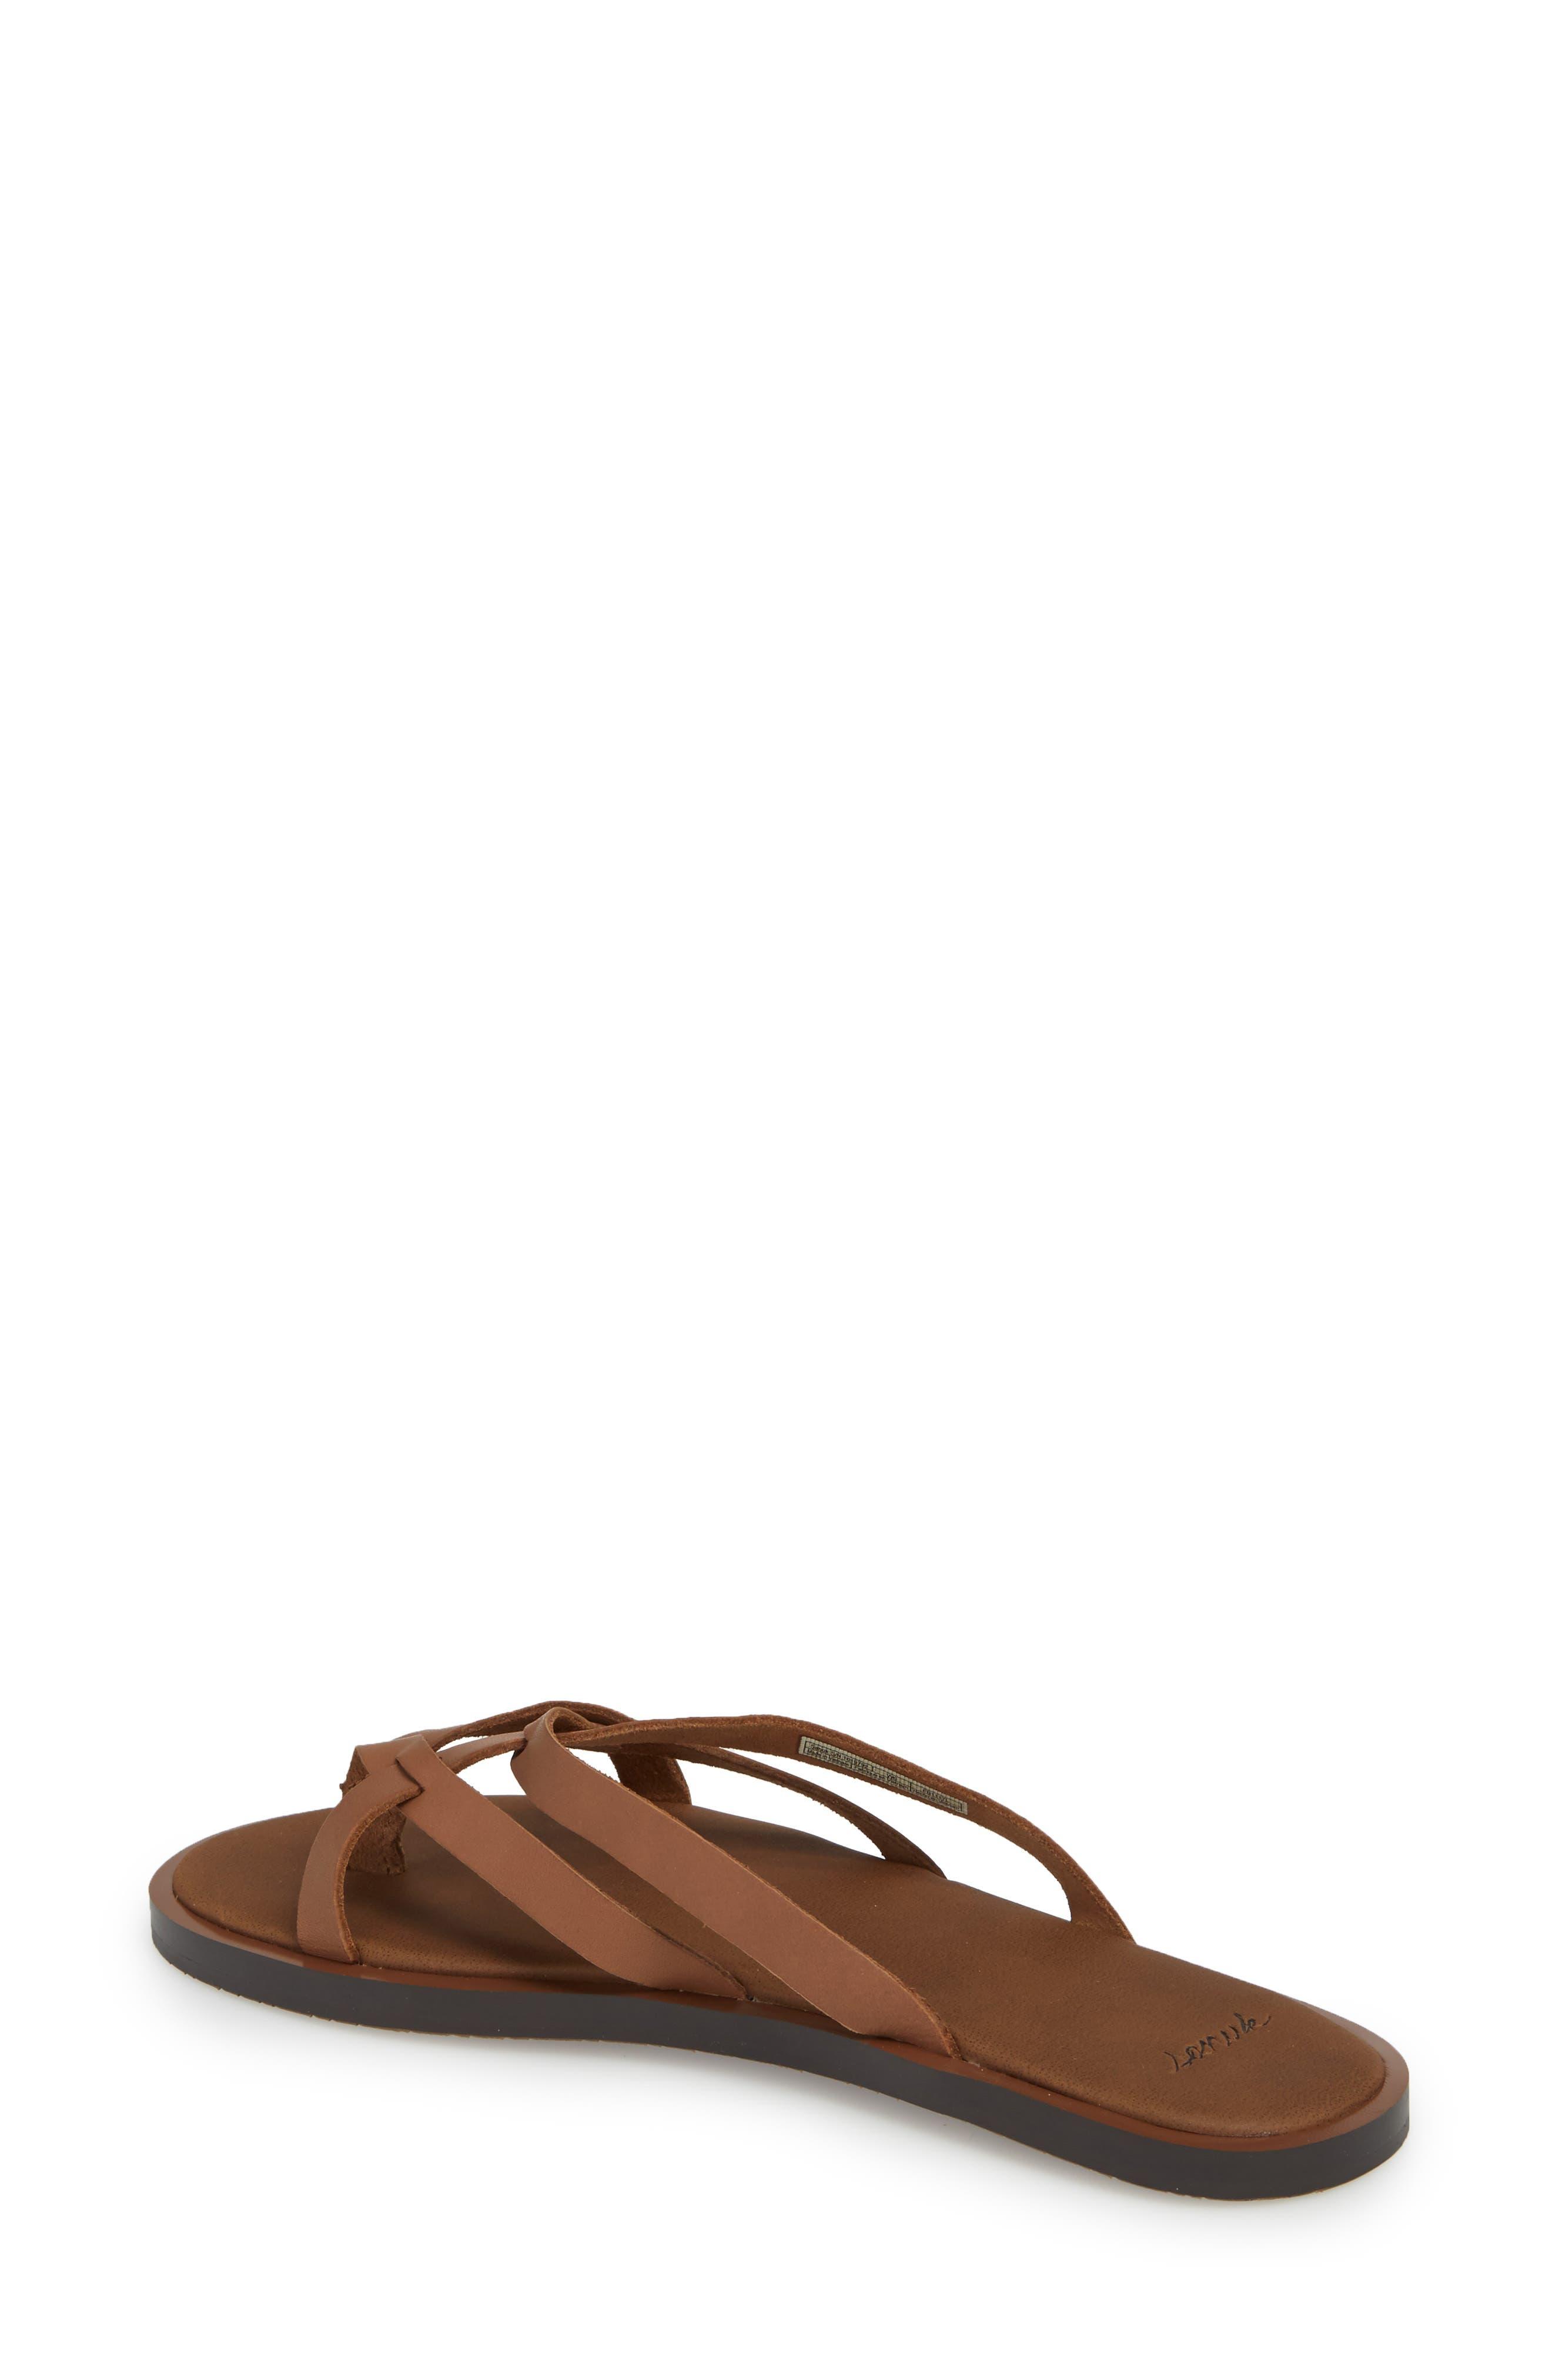 Yoga Strappy Thong Sandal,                             Alternate thumbnail 5, color,